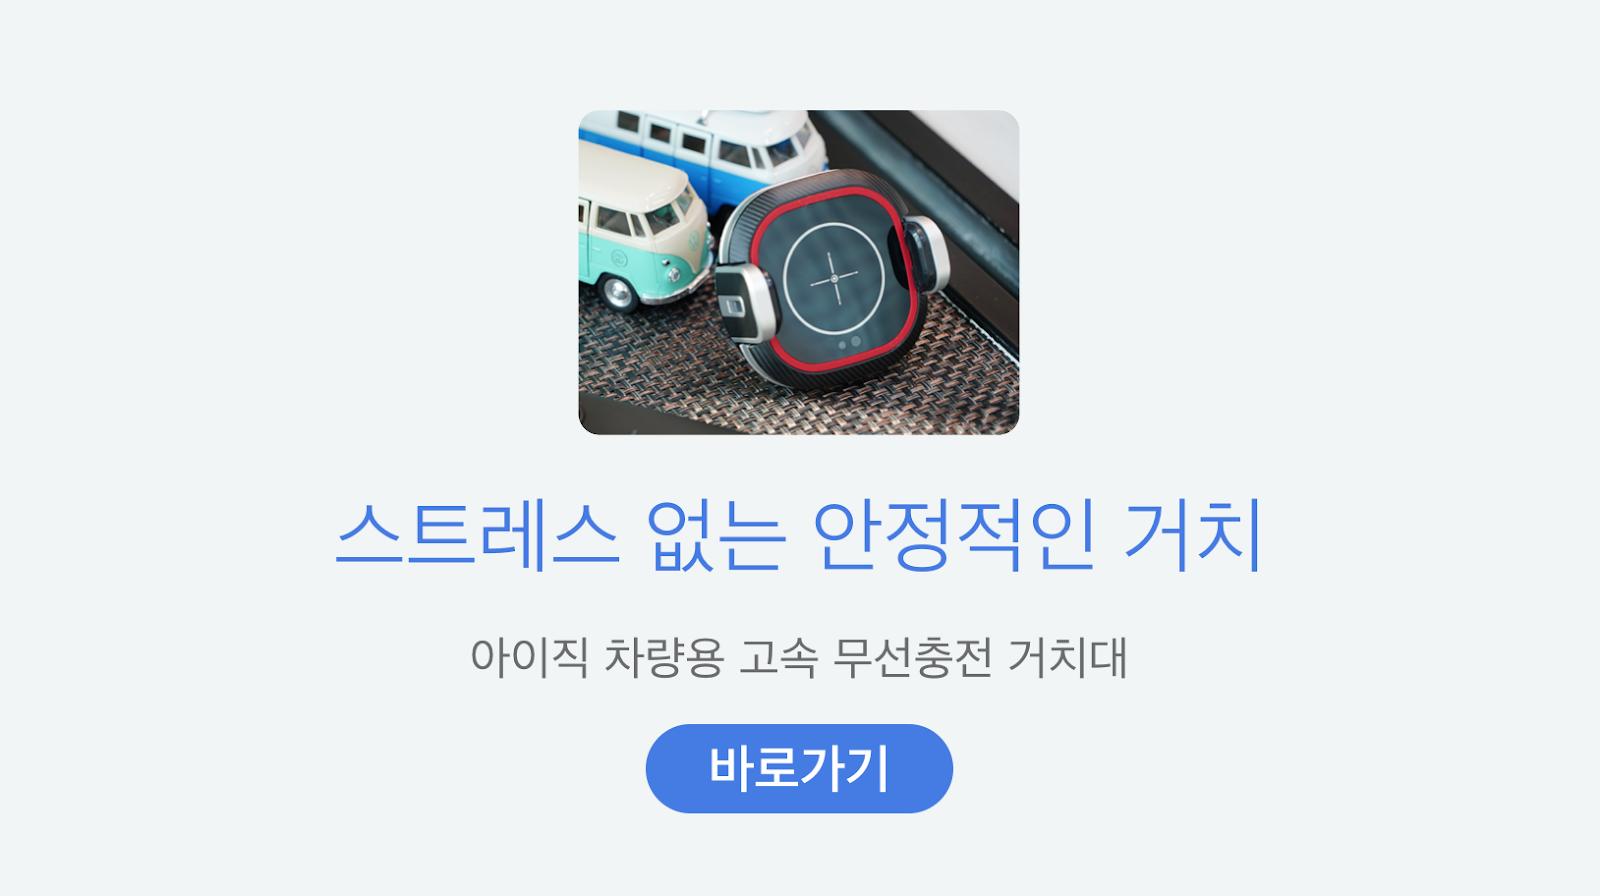 https://smartstore.naver.com/izicshop/products/4349382228